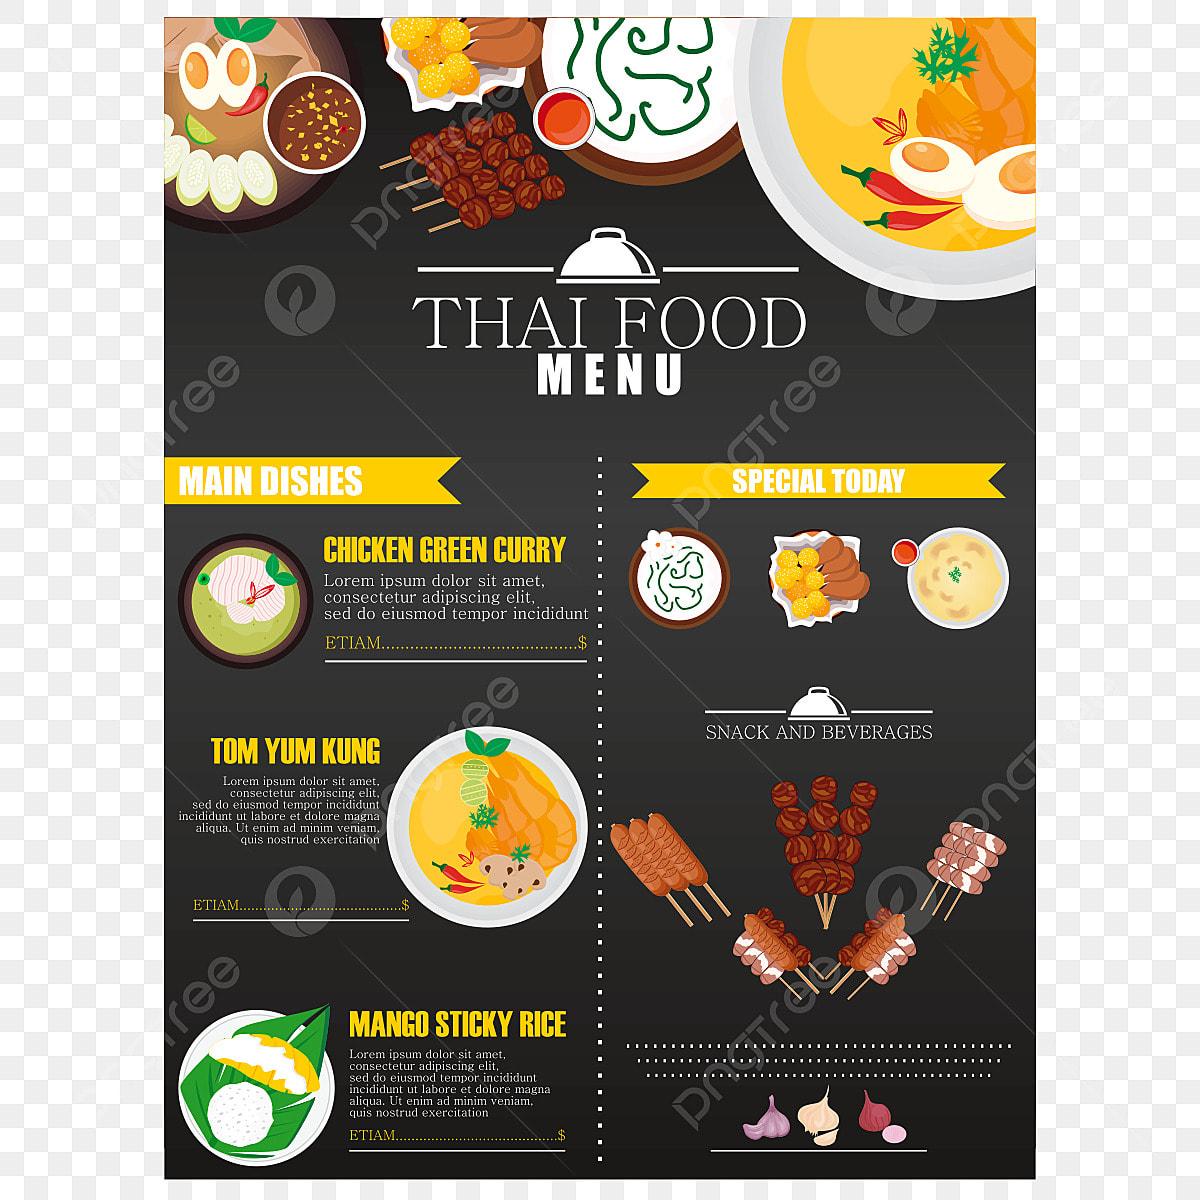 Vector Restaurant Menu Design Menu Clipart Hotel Recipes Hotels Menu Png Transparent Image And Clipart For Free Download